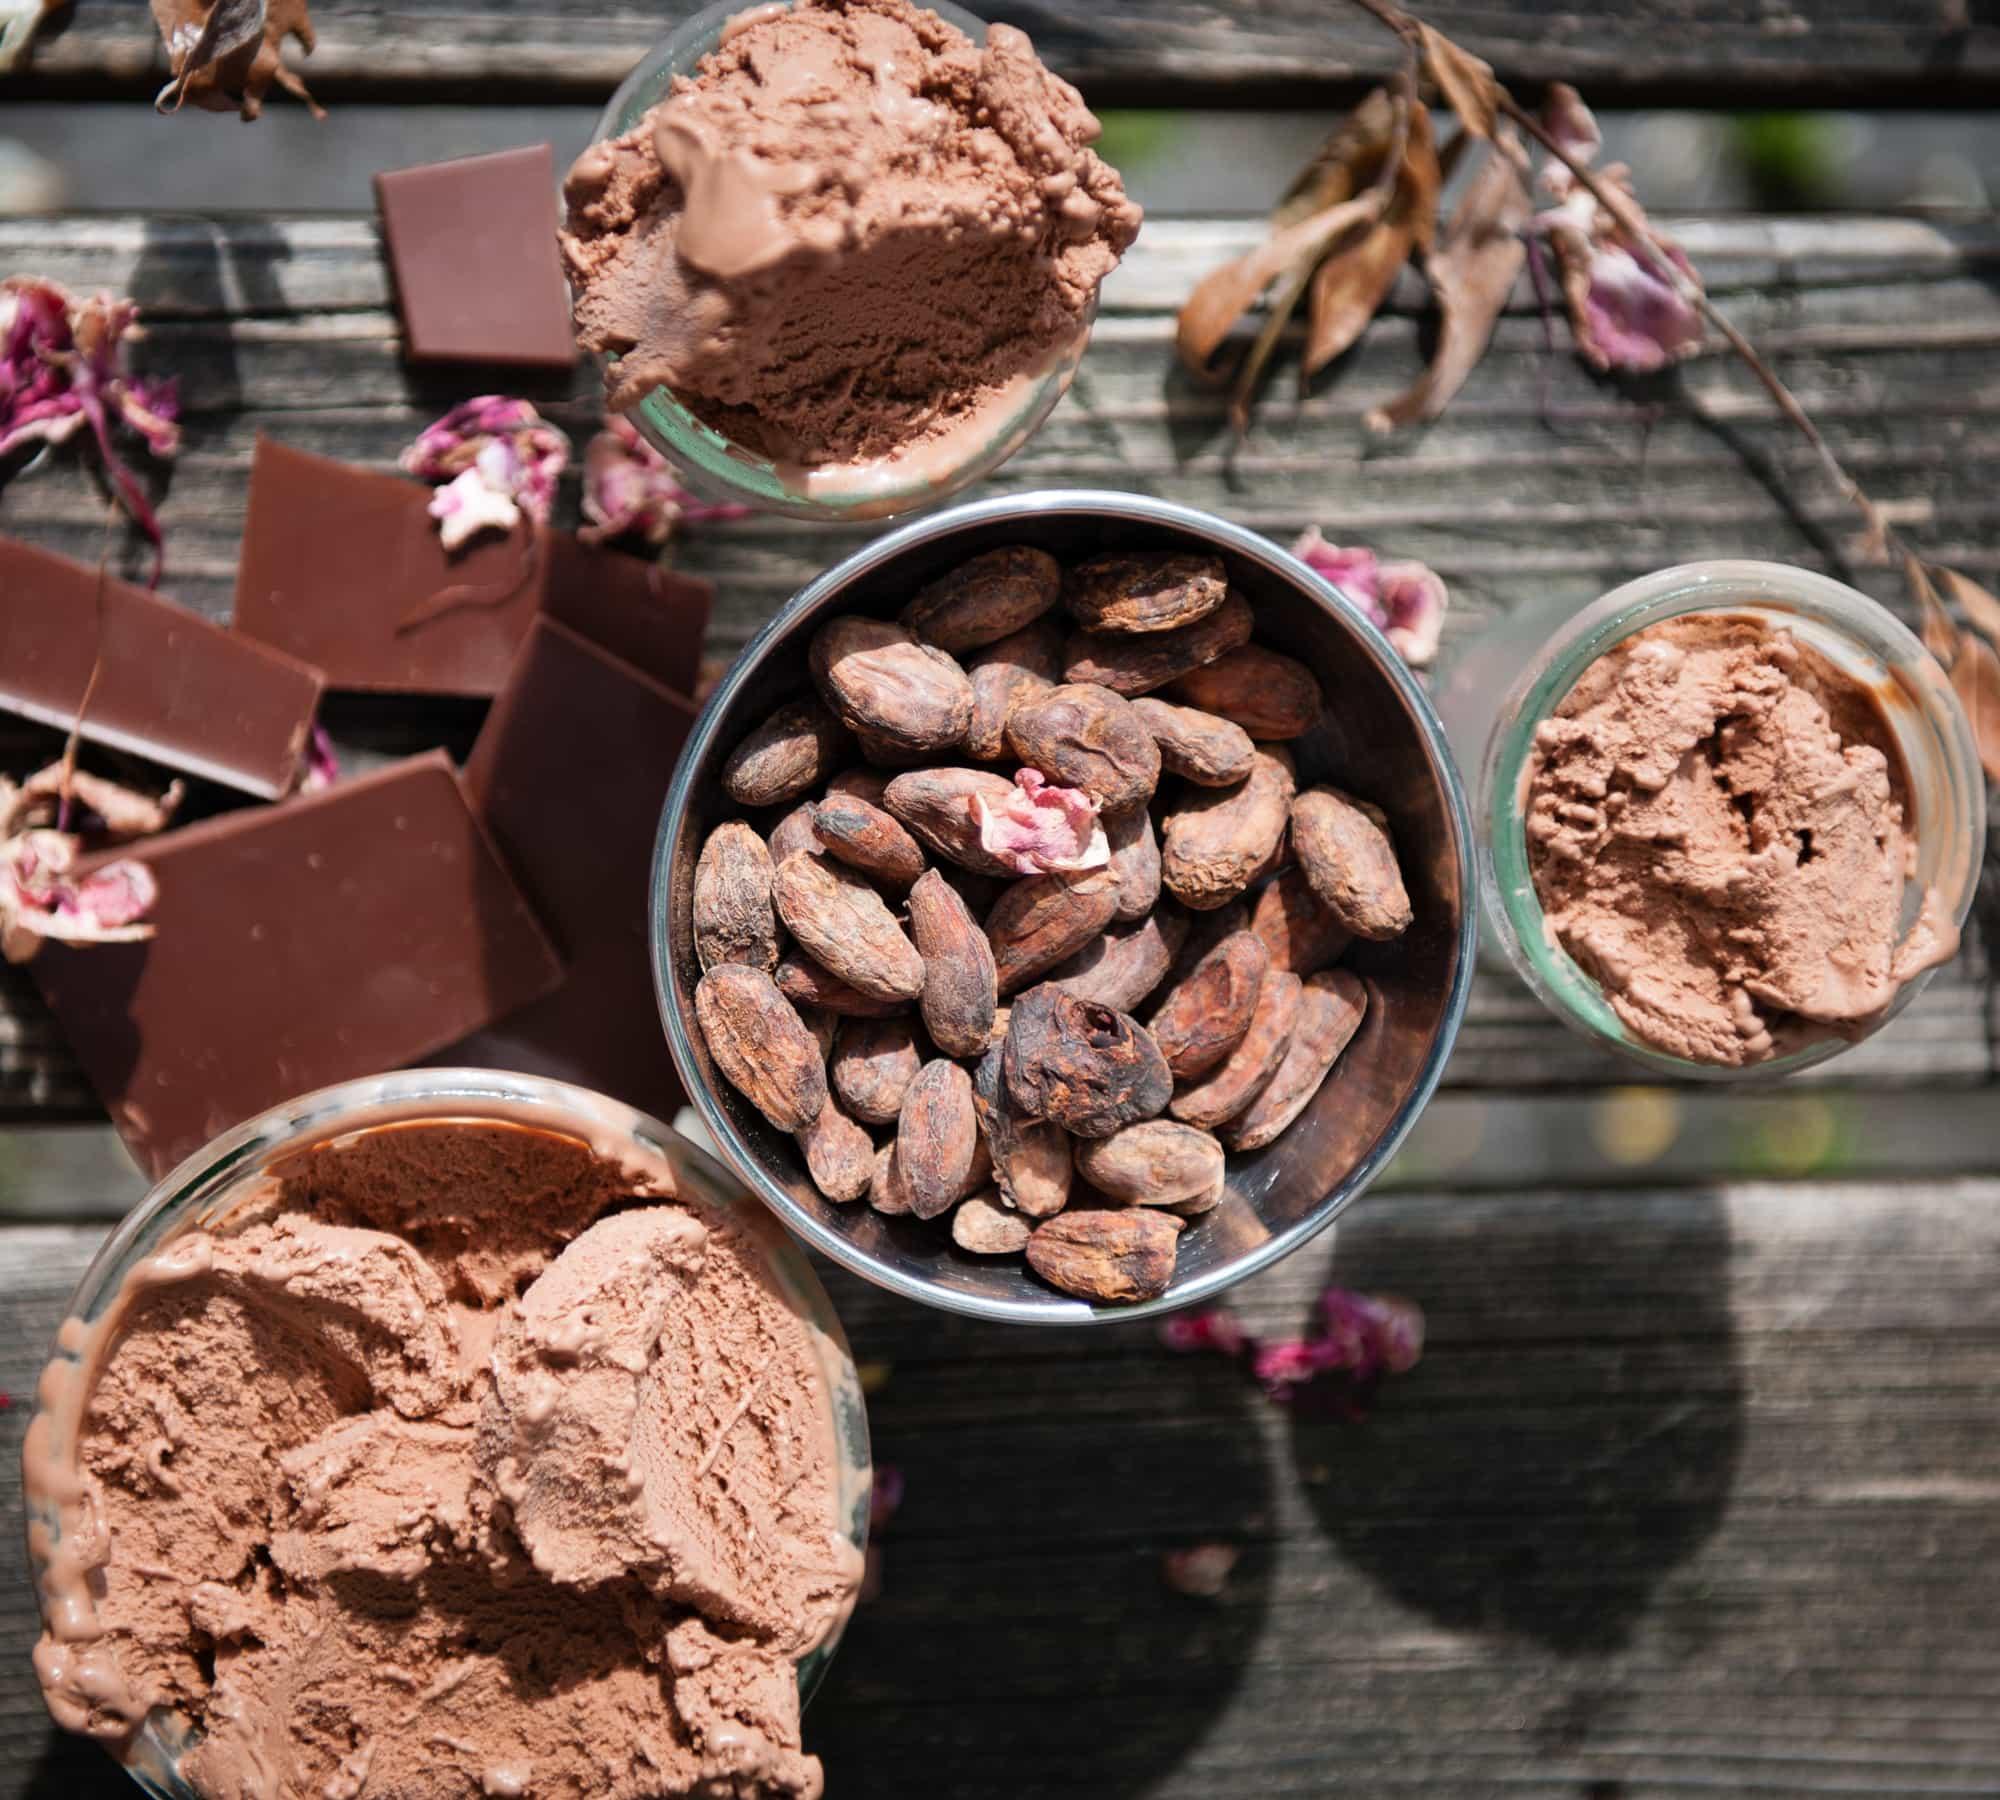 del fiore Eis Schokolade // HIMBEER